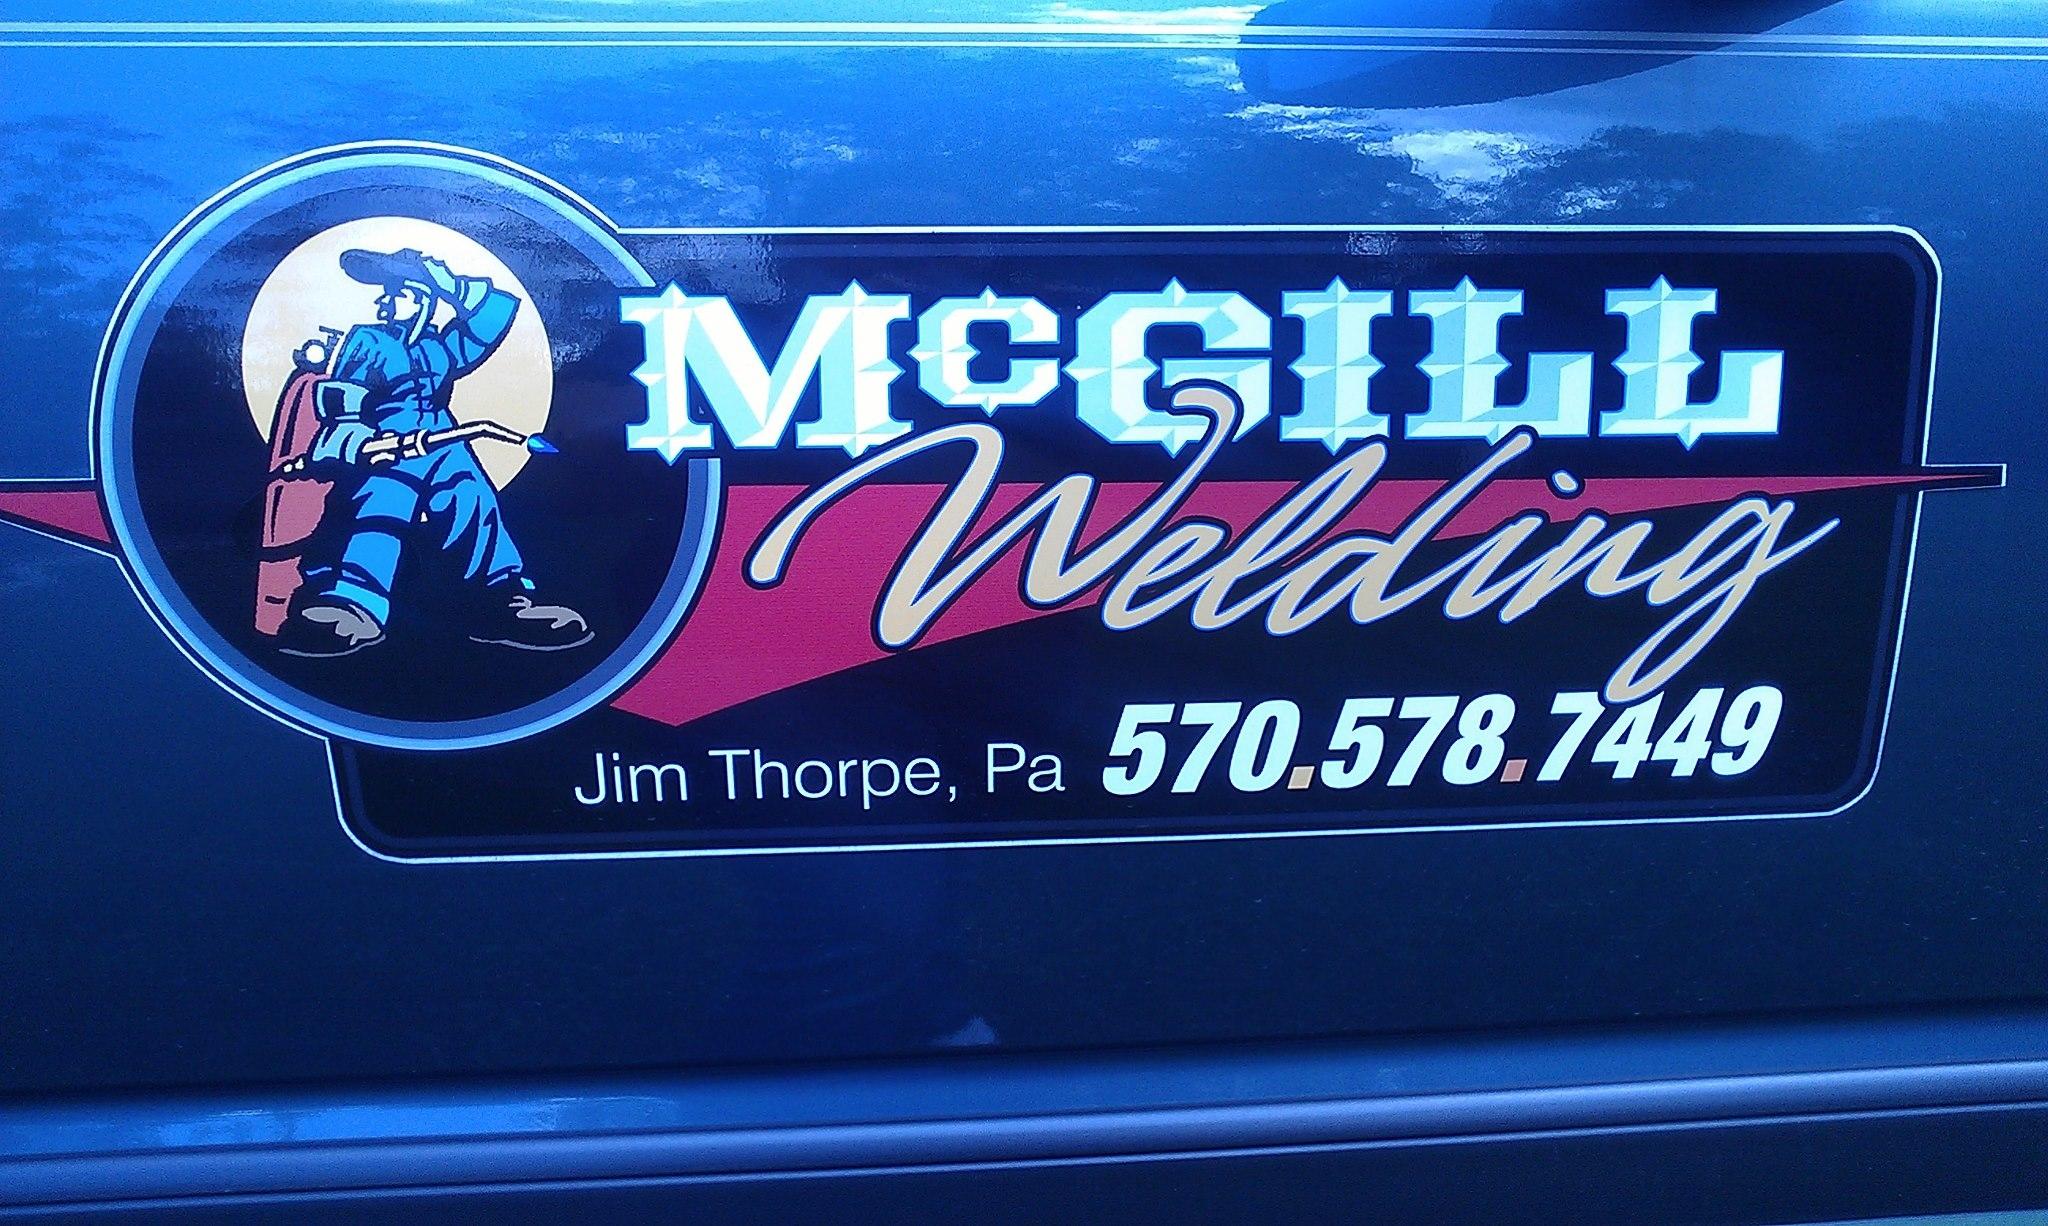 Mcgill Welding